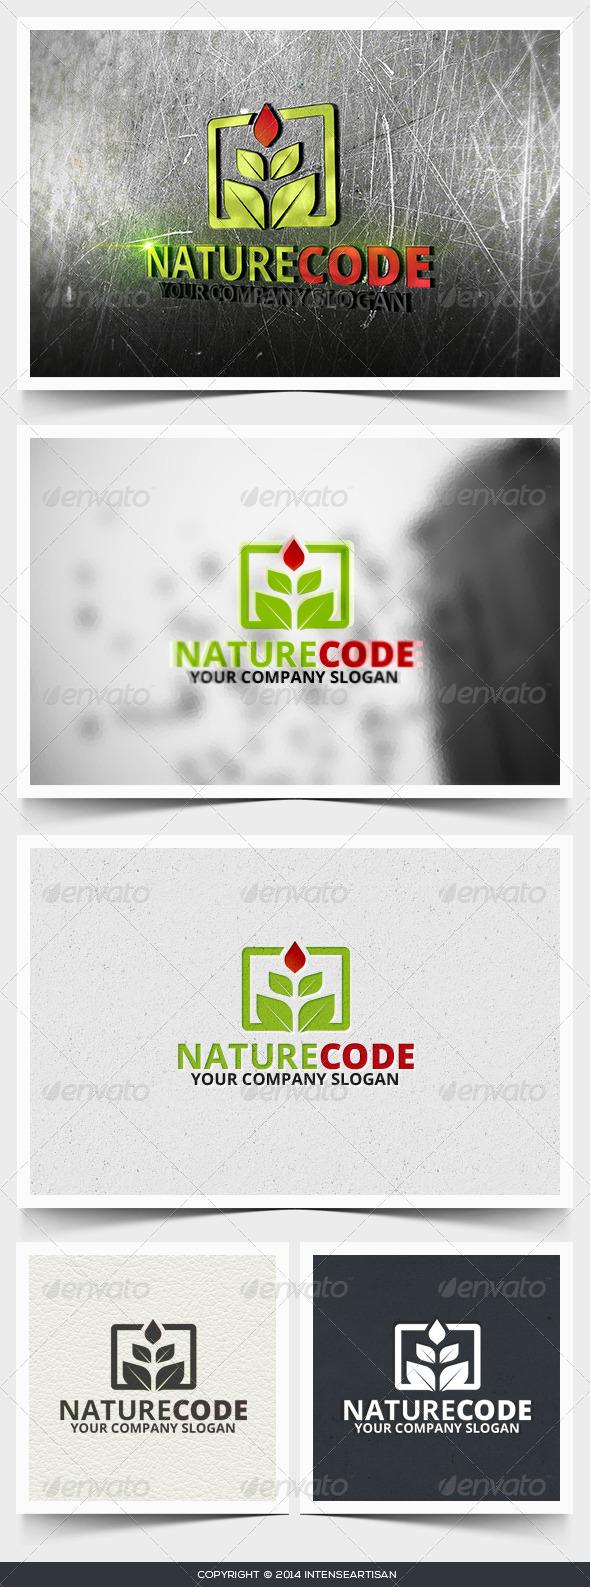 Nature Code Logo Template - Nature Logo Templates